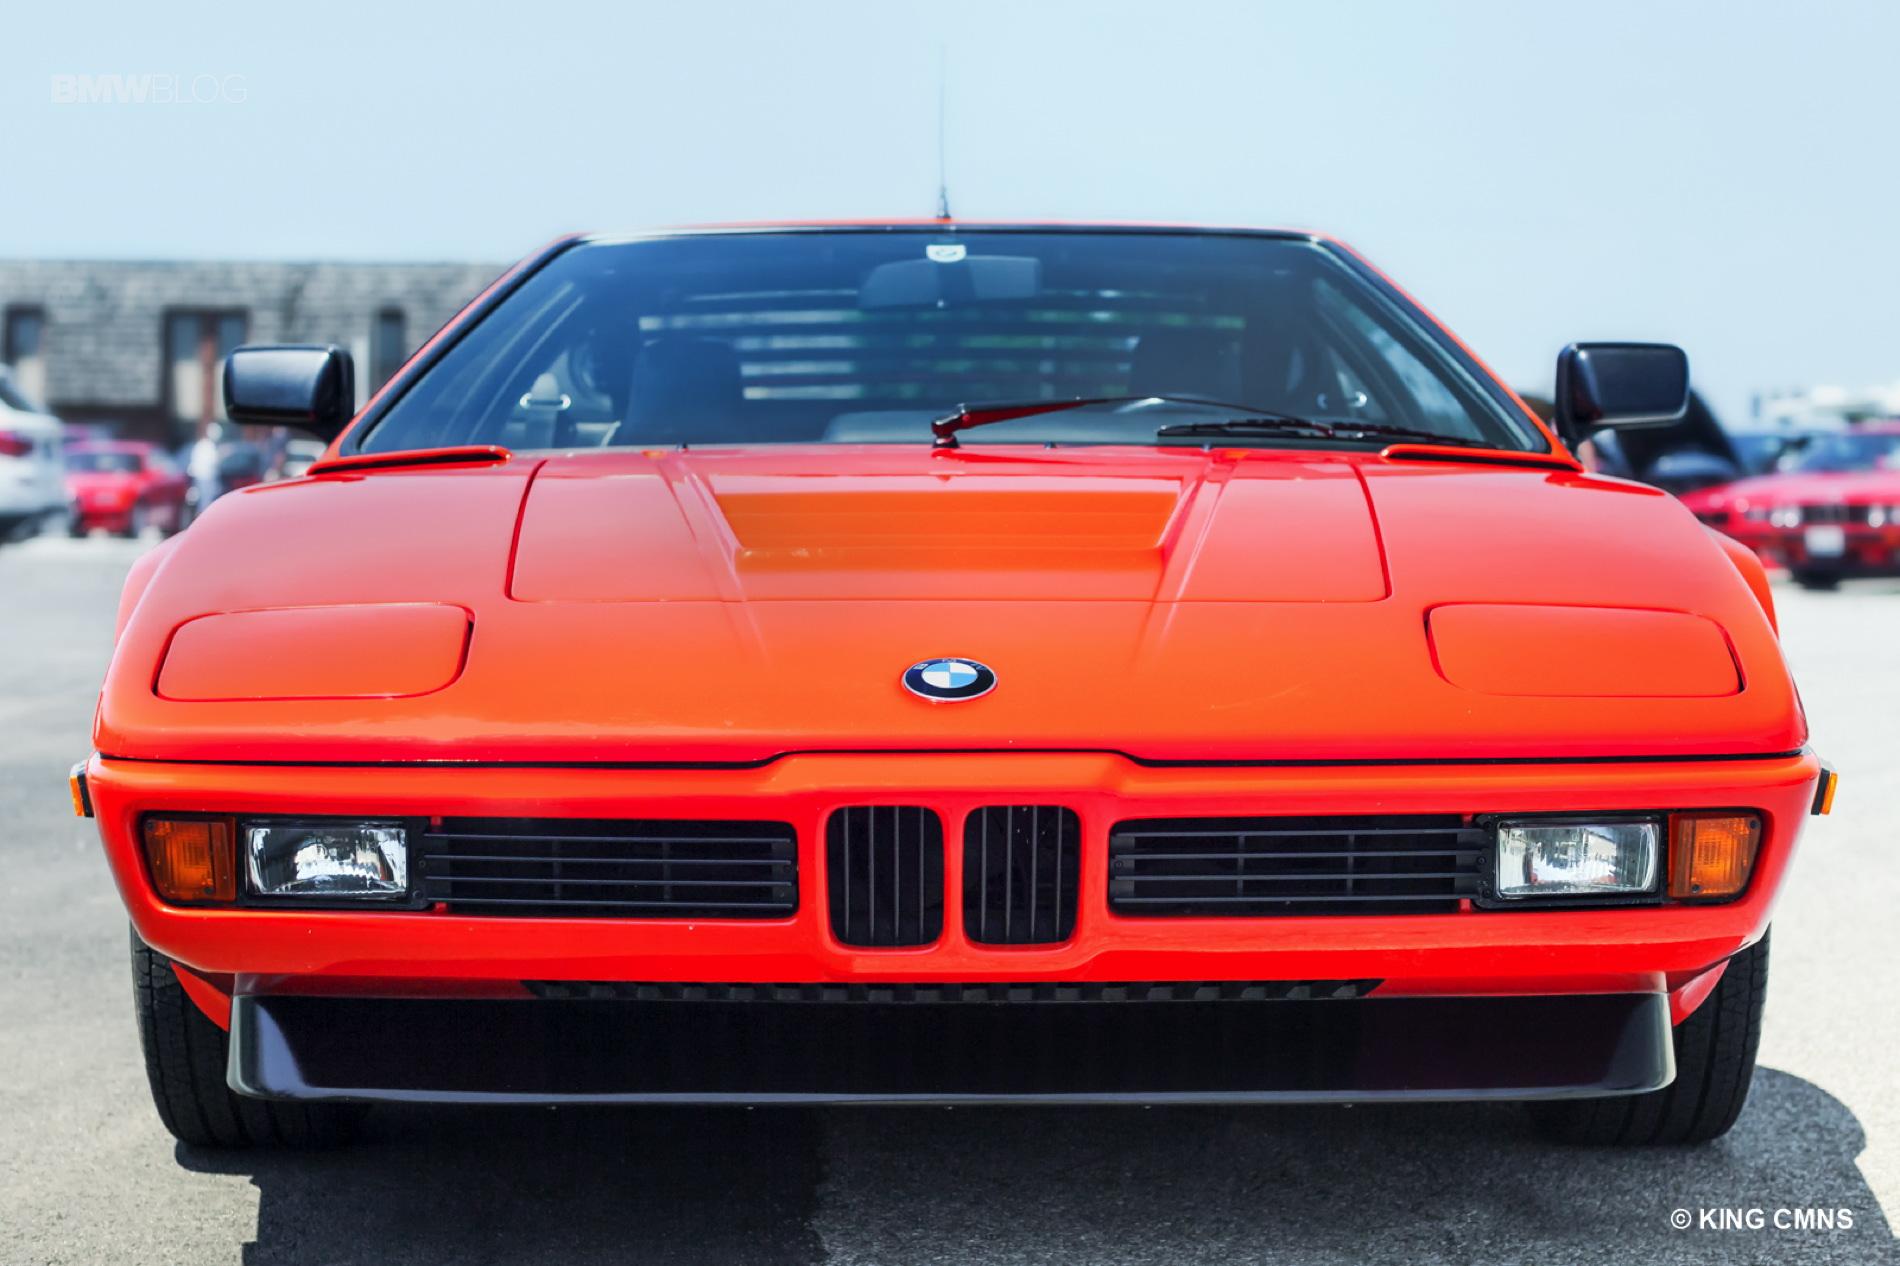 BMW M1 images 2016 11